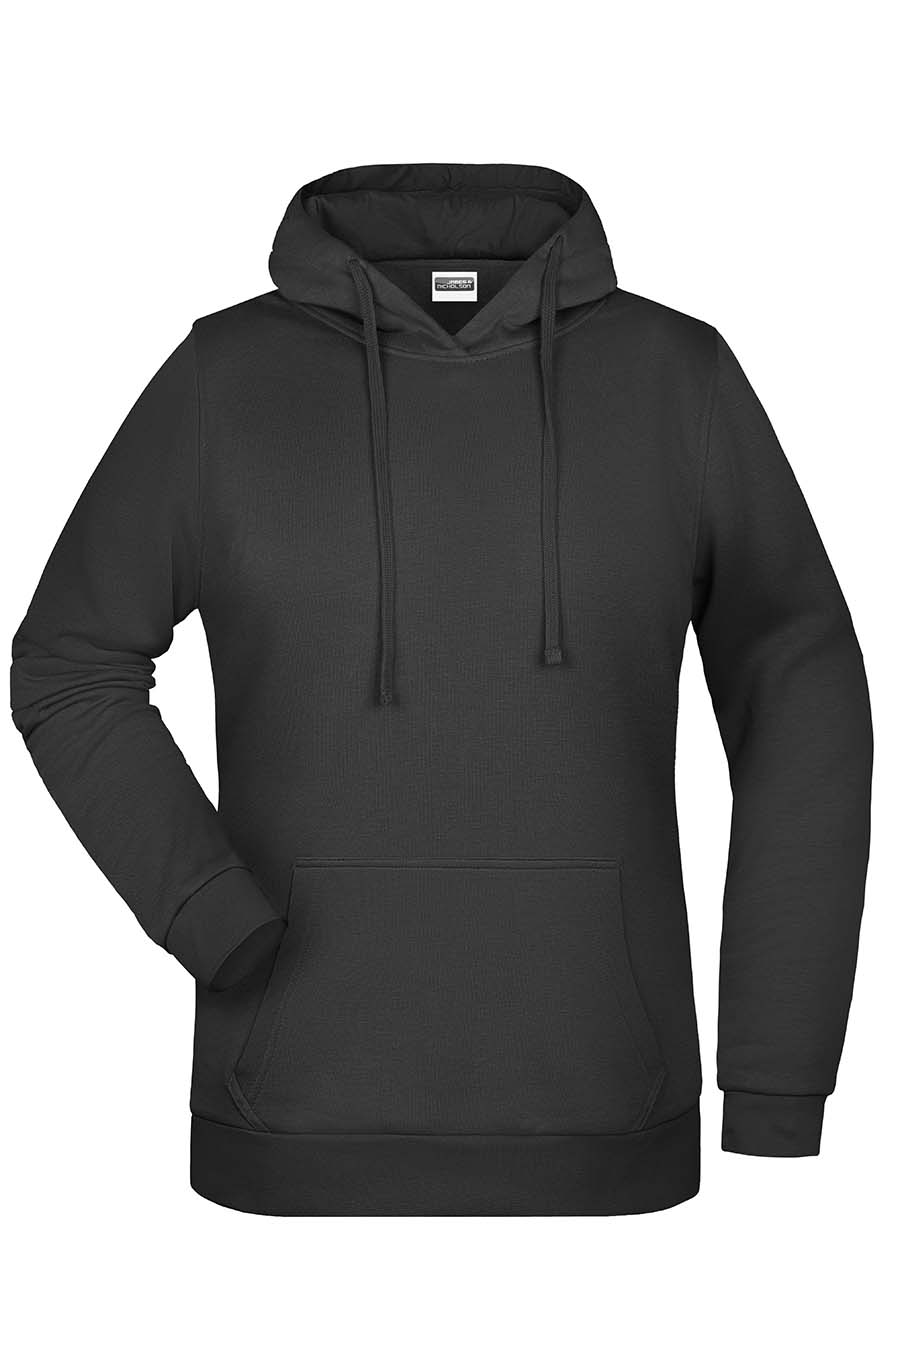 Sweat-shirt capuche femme - 20-1494-2